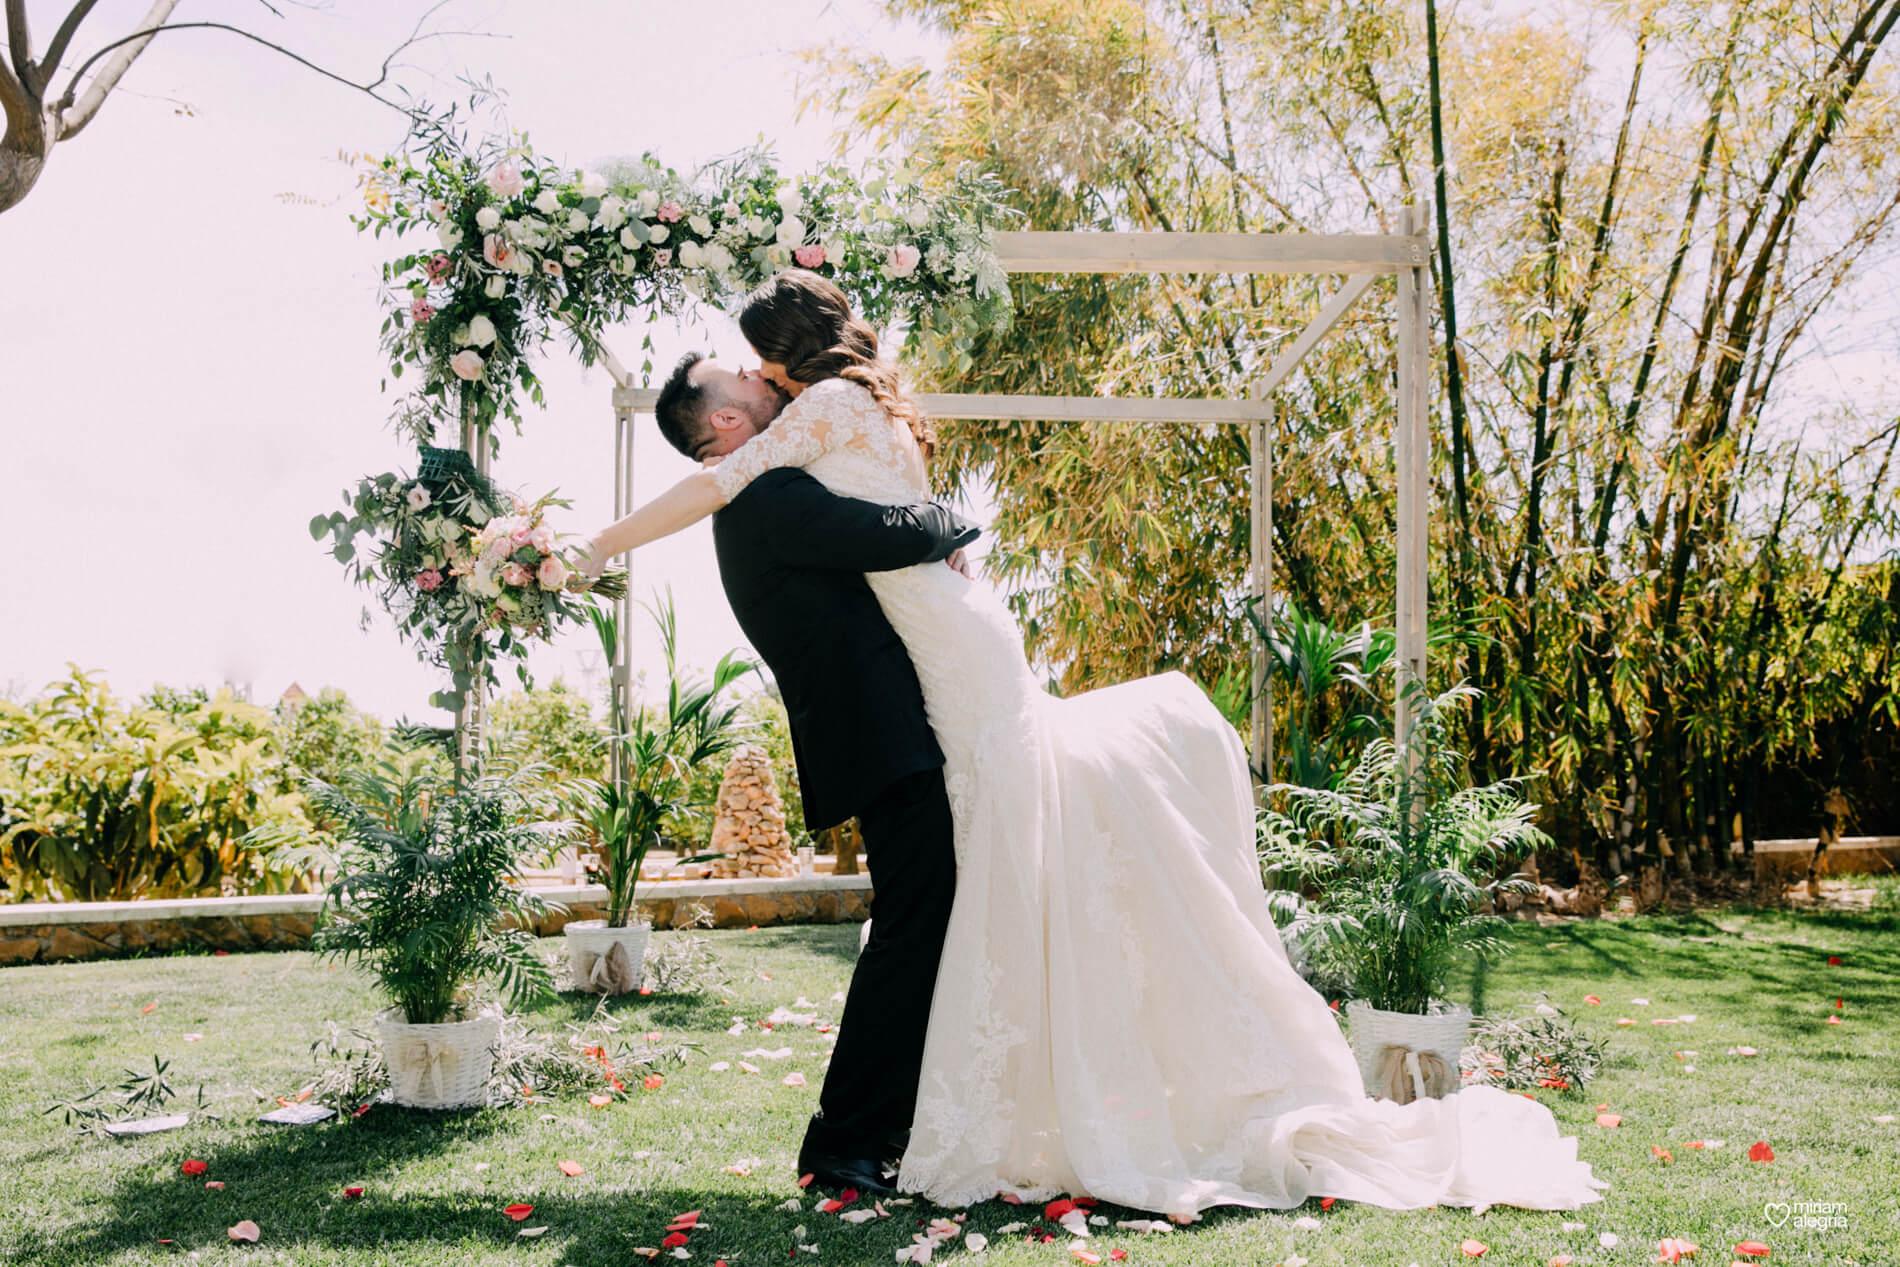 boda-en-finca-jurosa-miriam-alegria-96